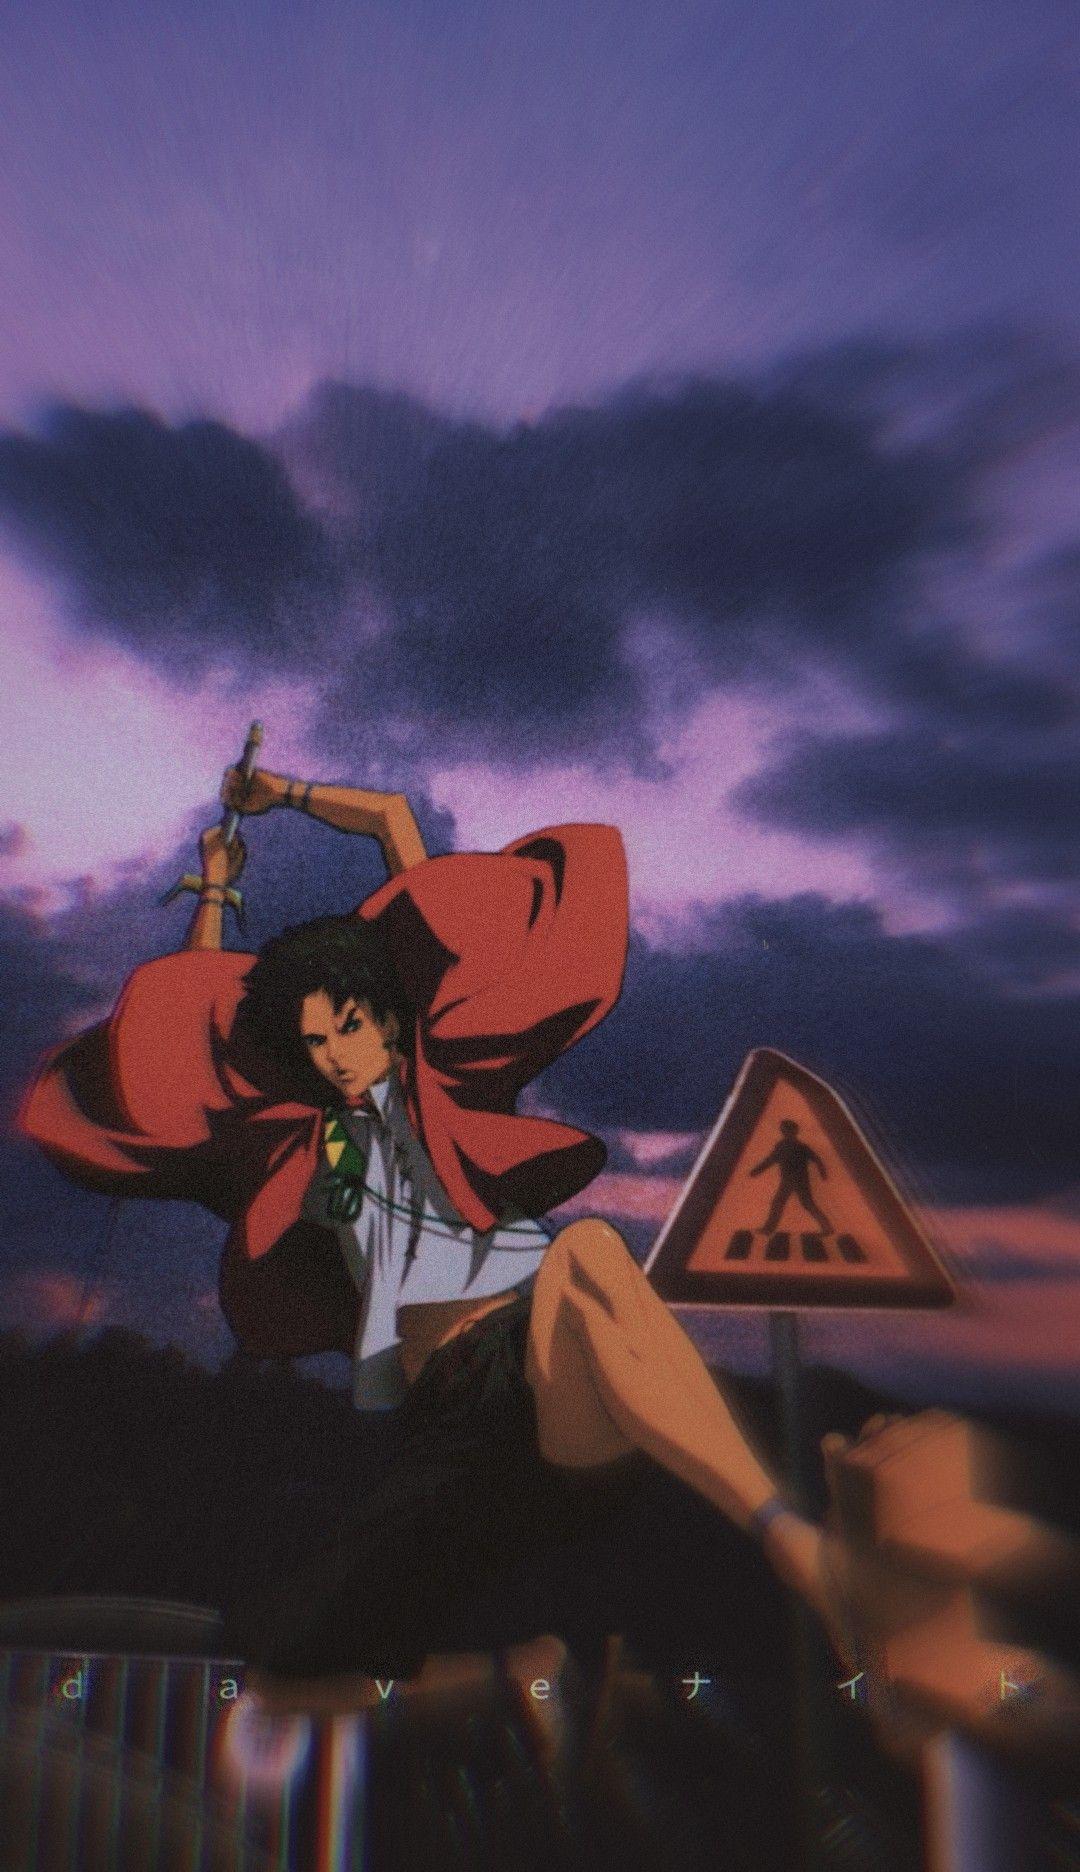 Mugen Samurai Champloo Aesthetic Edit In 2020 Samurai Champloo Anime Wall Art Anime Wallpaper